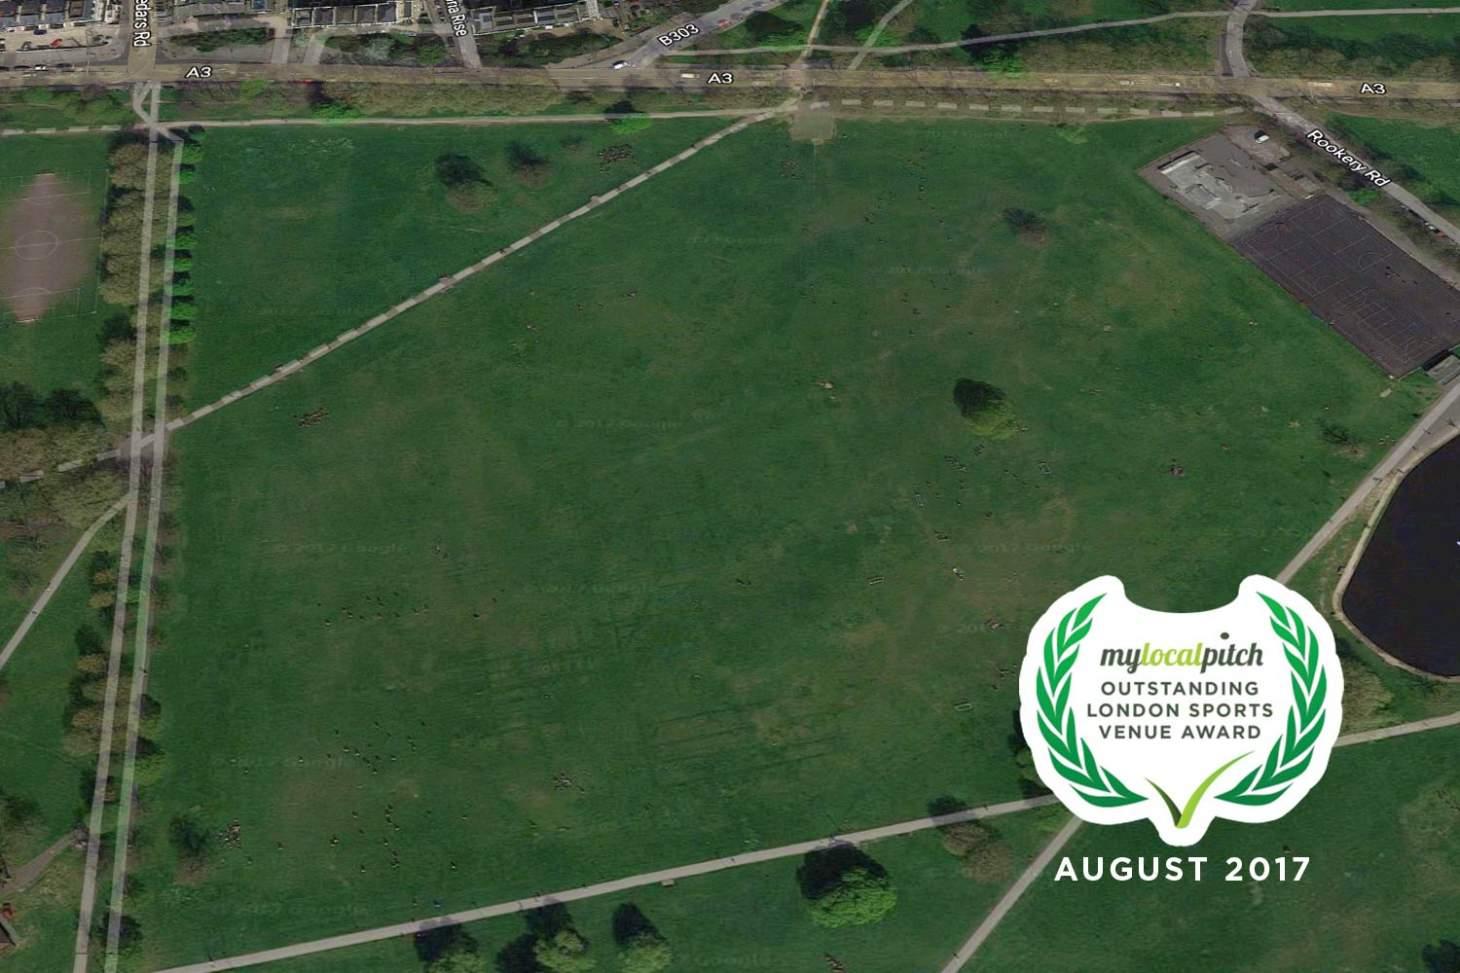 Clapham Common Nets   Artificial cricket facilities